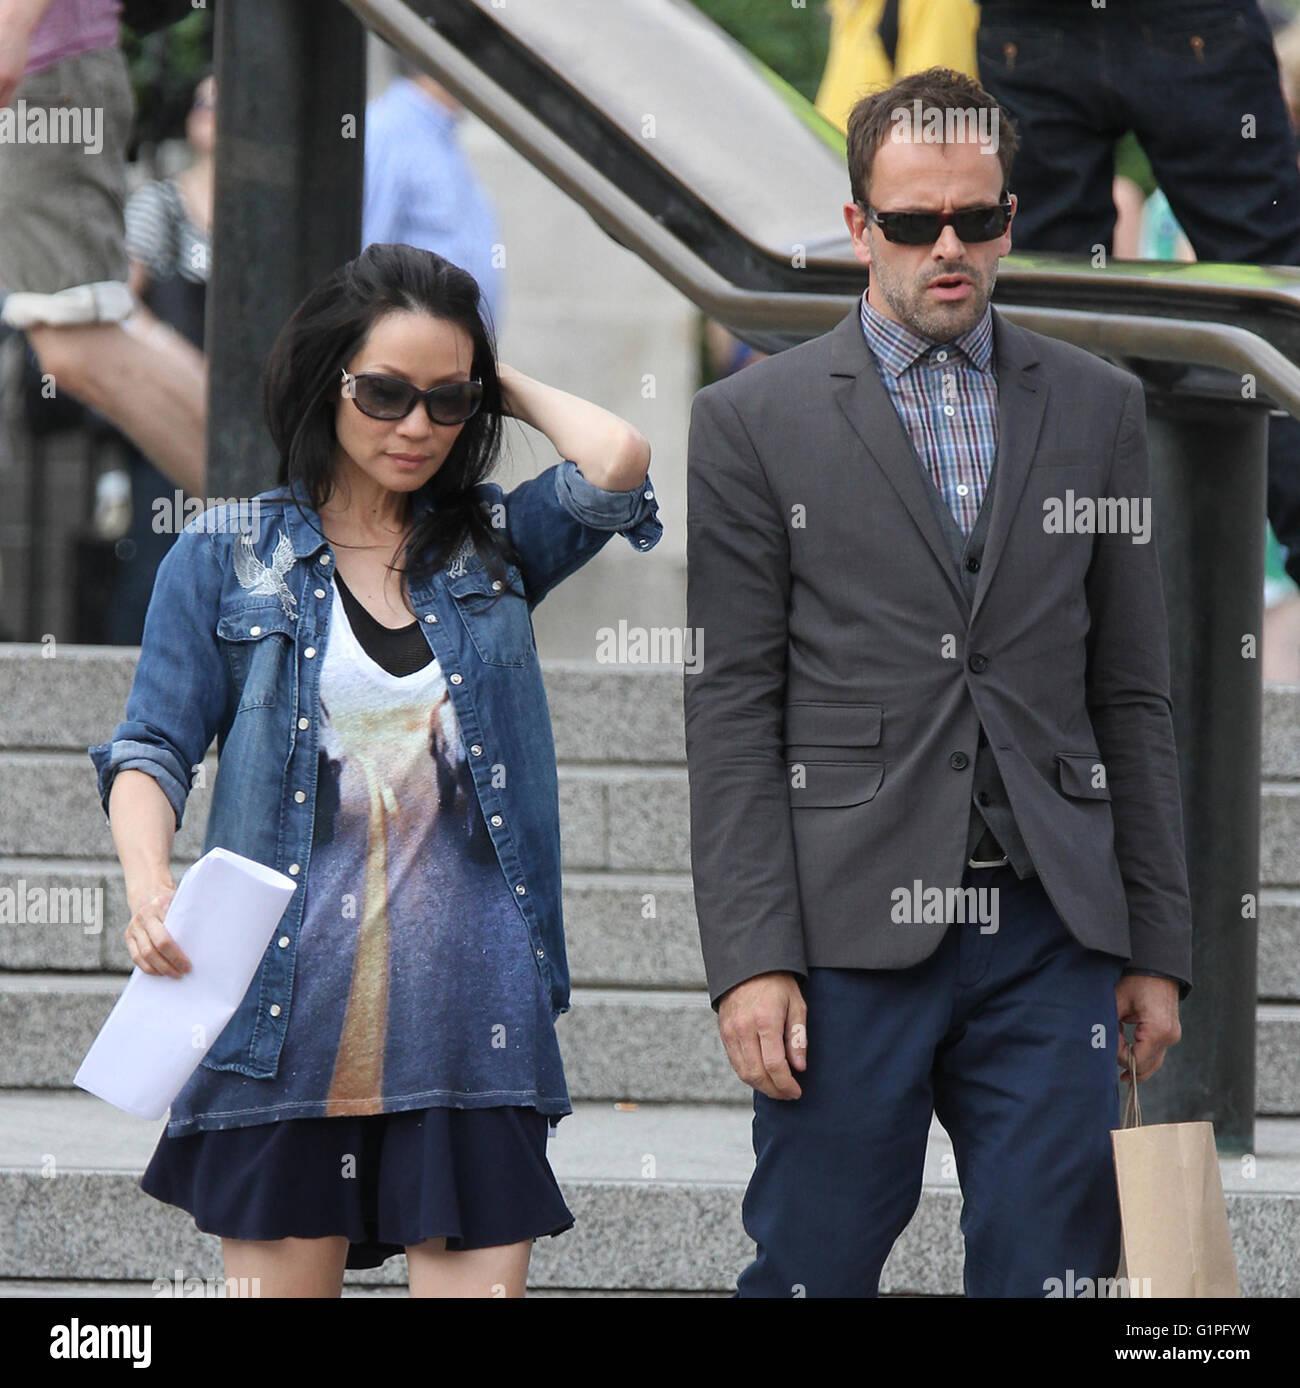 LONDON, UK - JULY 10, 2013: Lucy Liu and Jonny Lee Miller sighting on set filming Elementary in Trafalgar Square - Stock Image